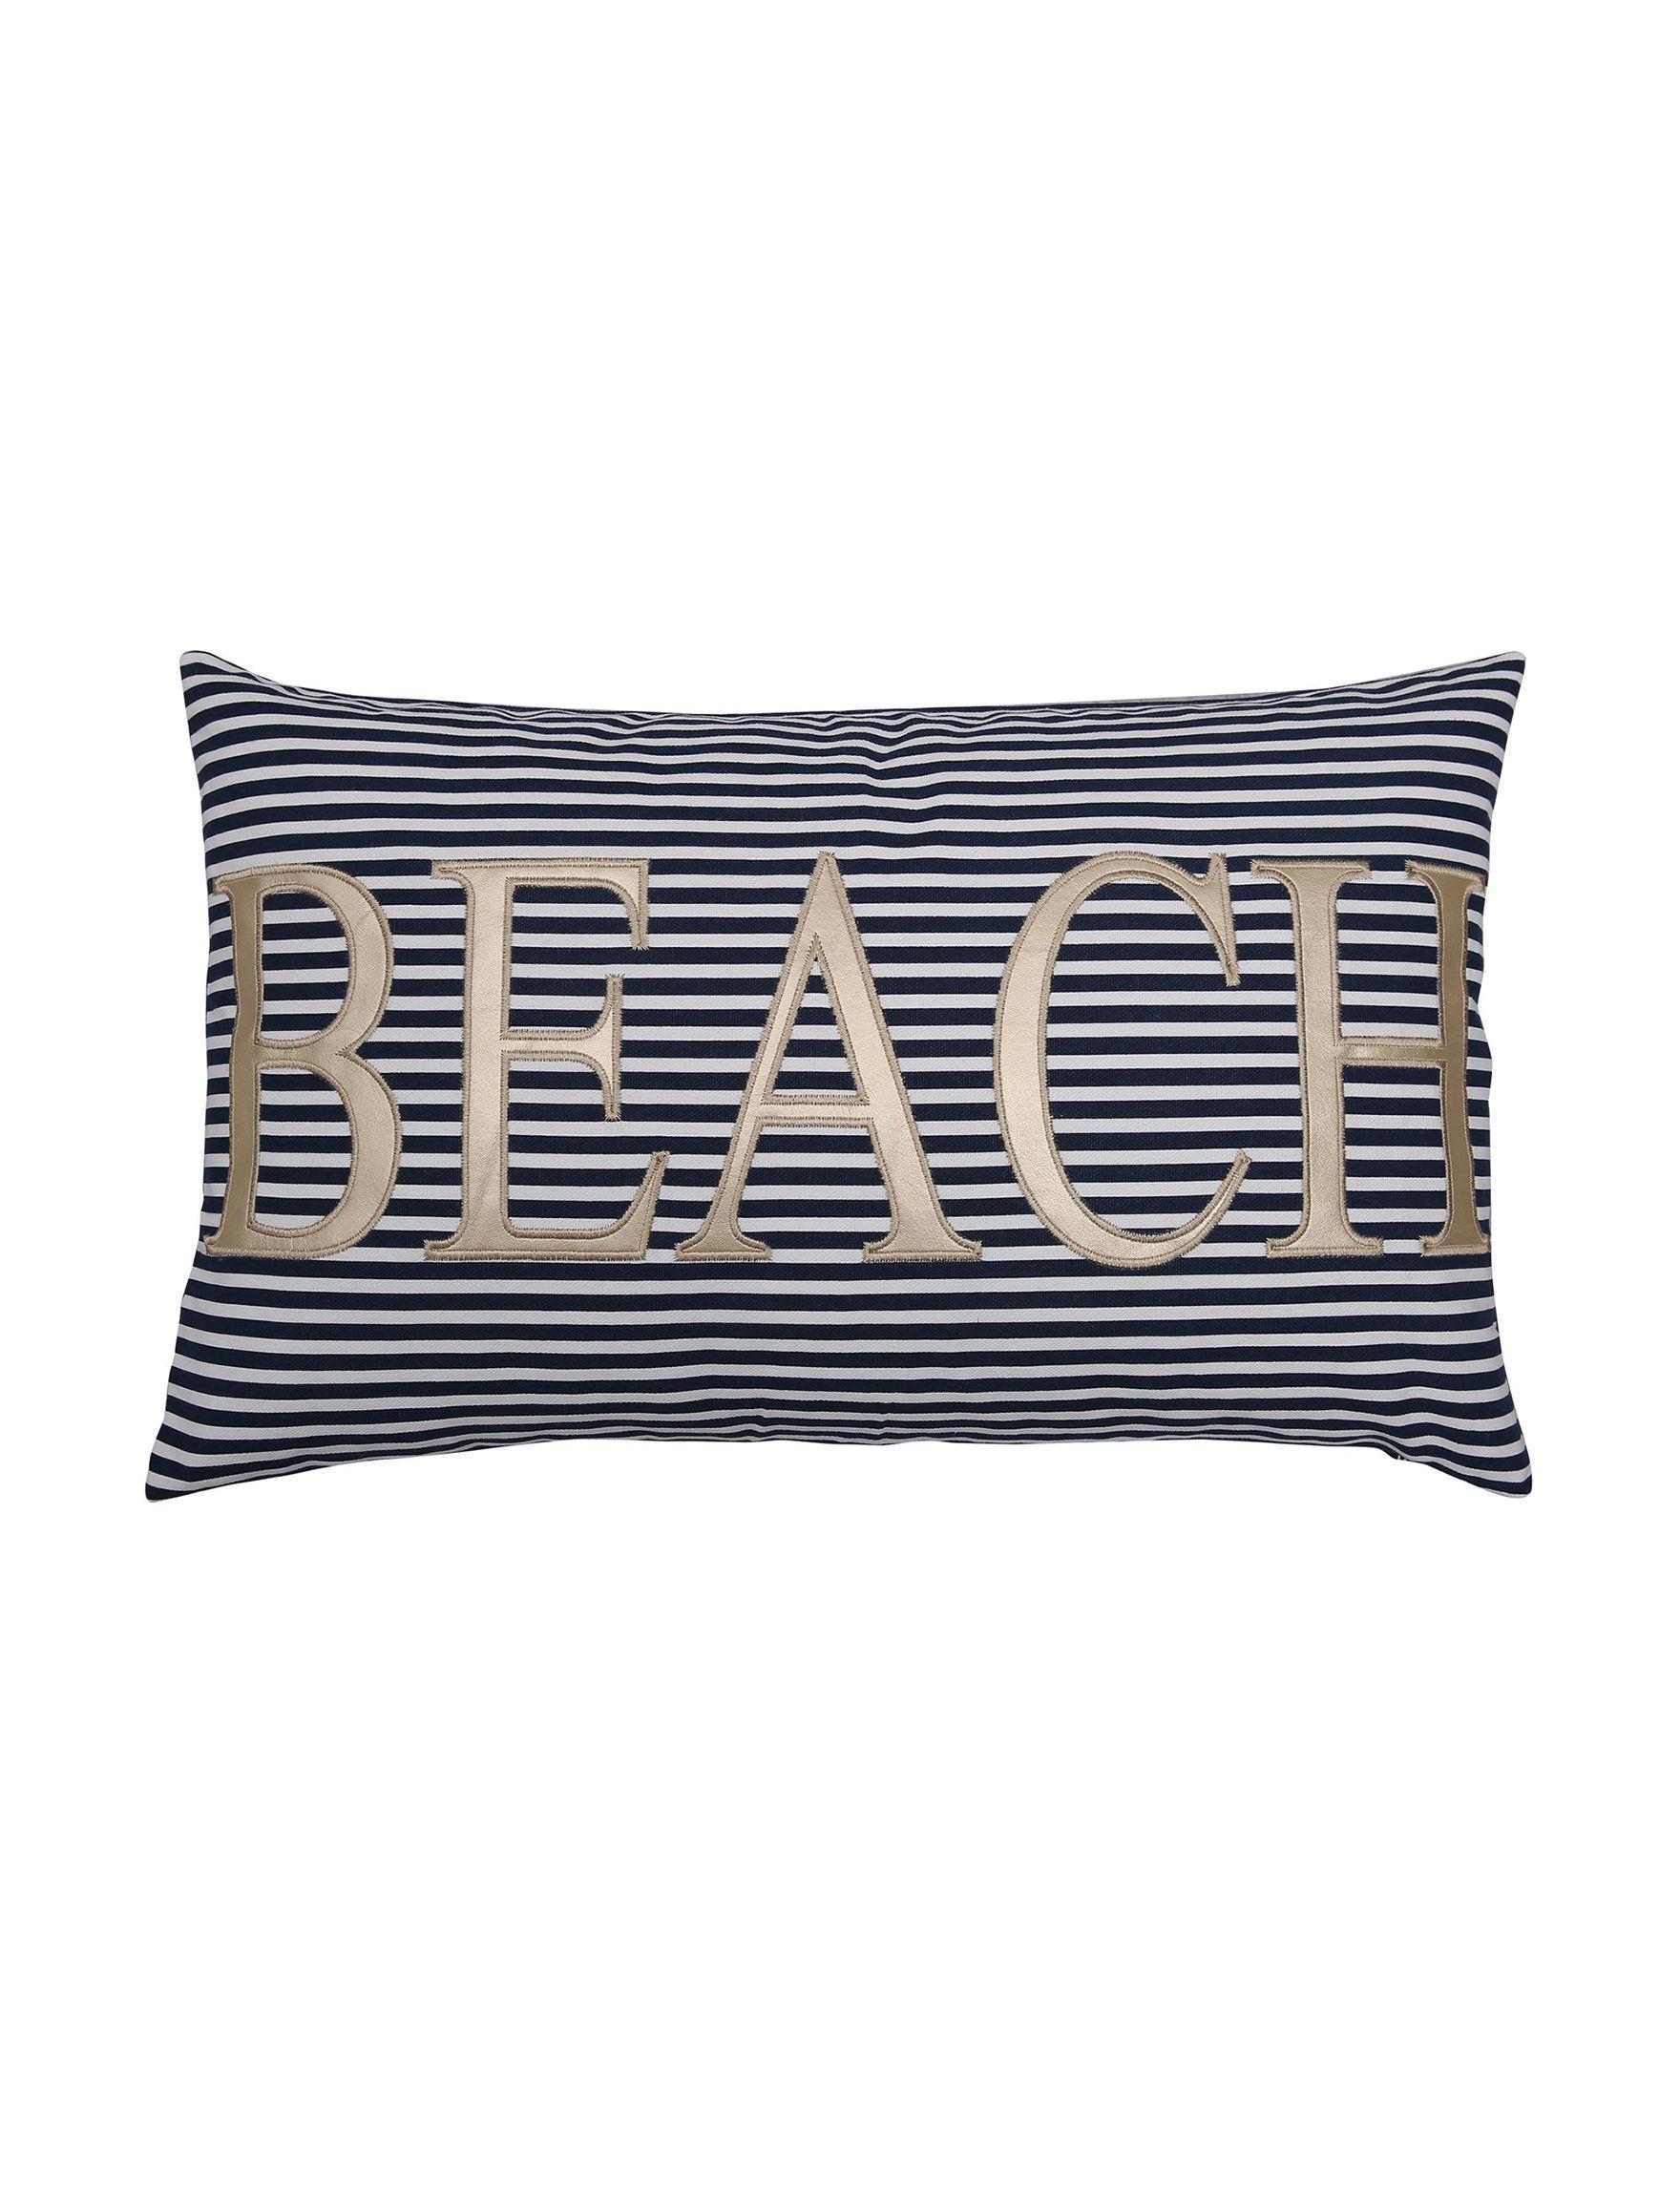 Lush Decor Navy Decorative Pillows